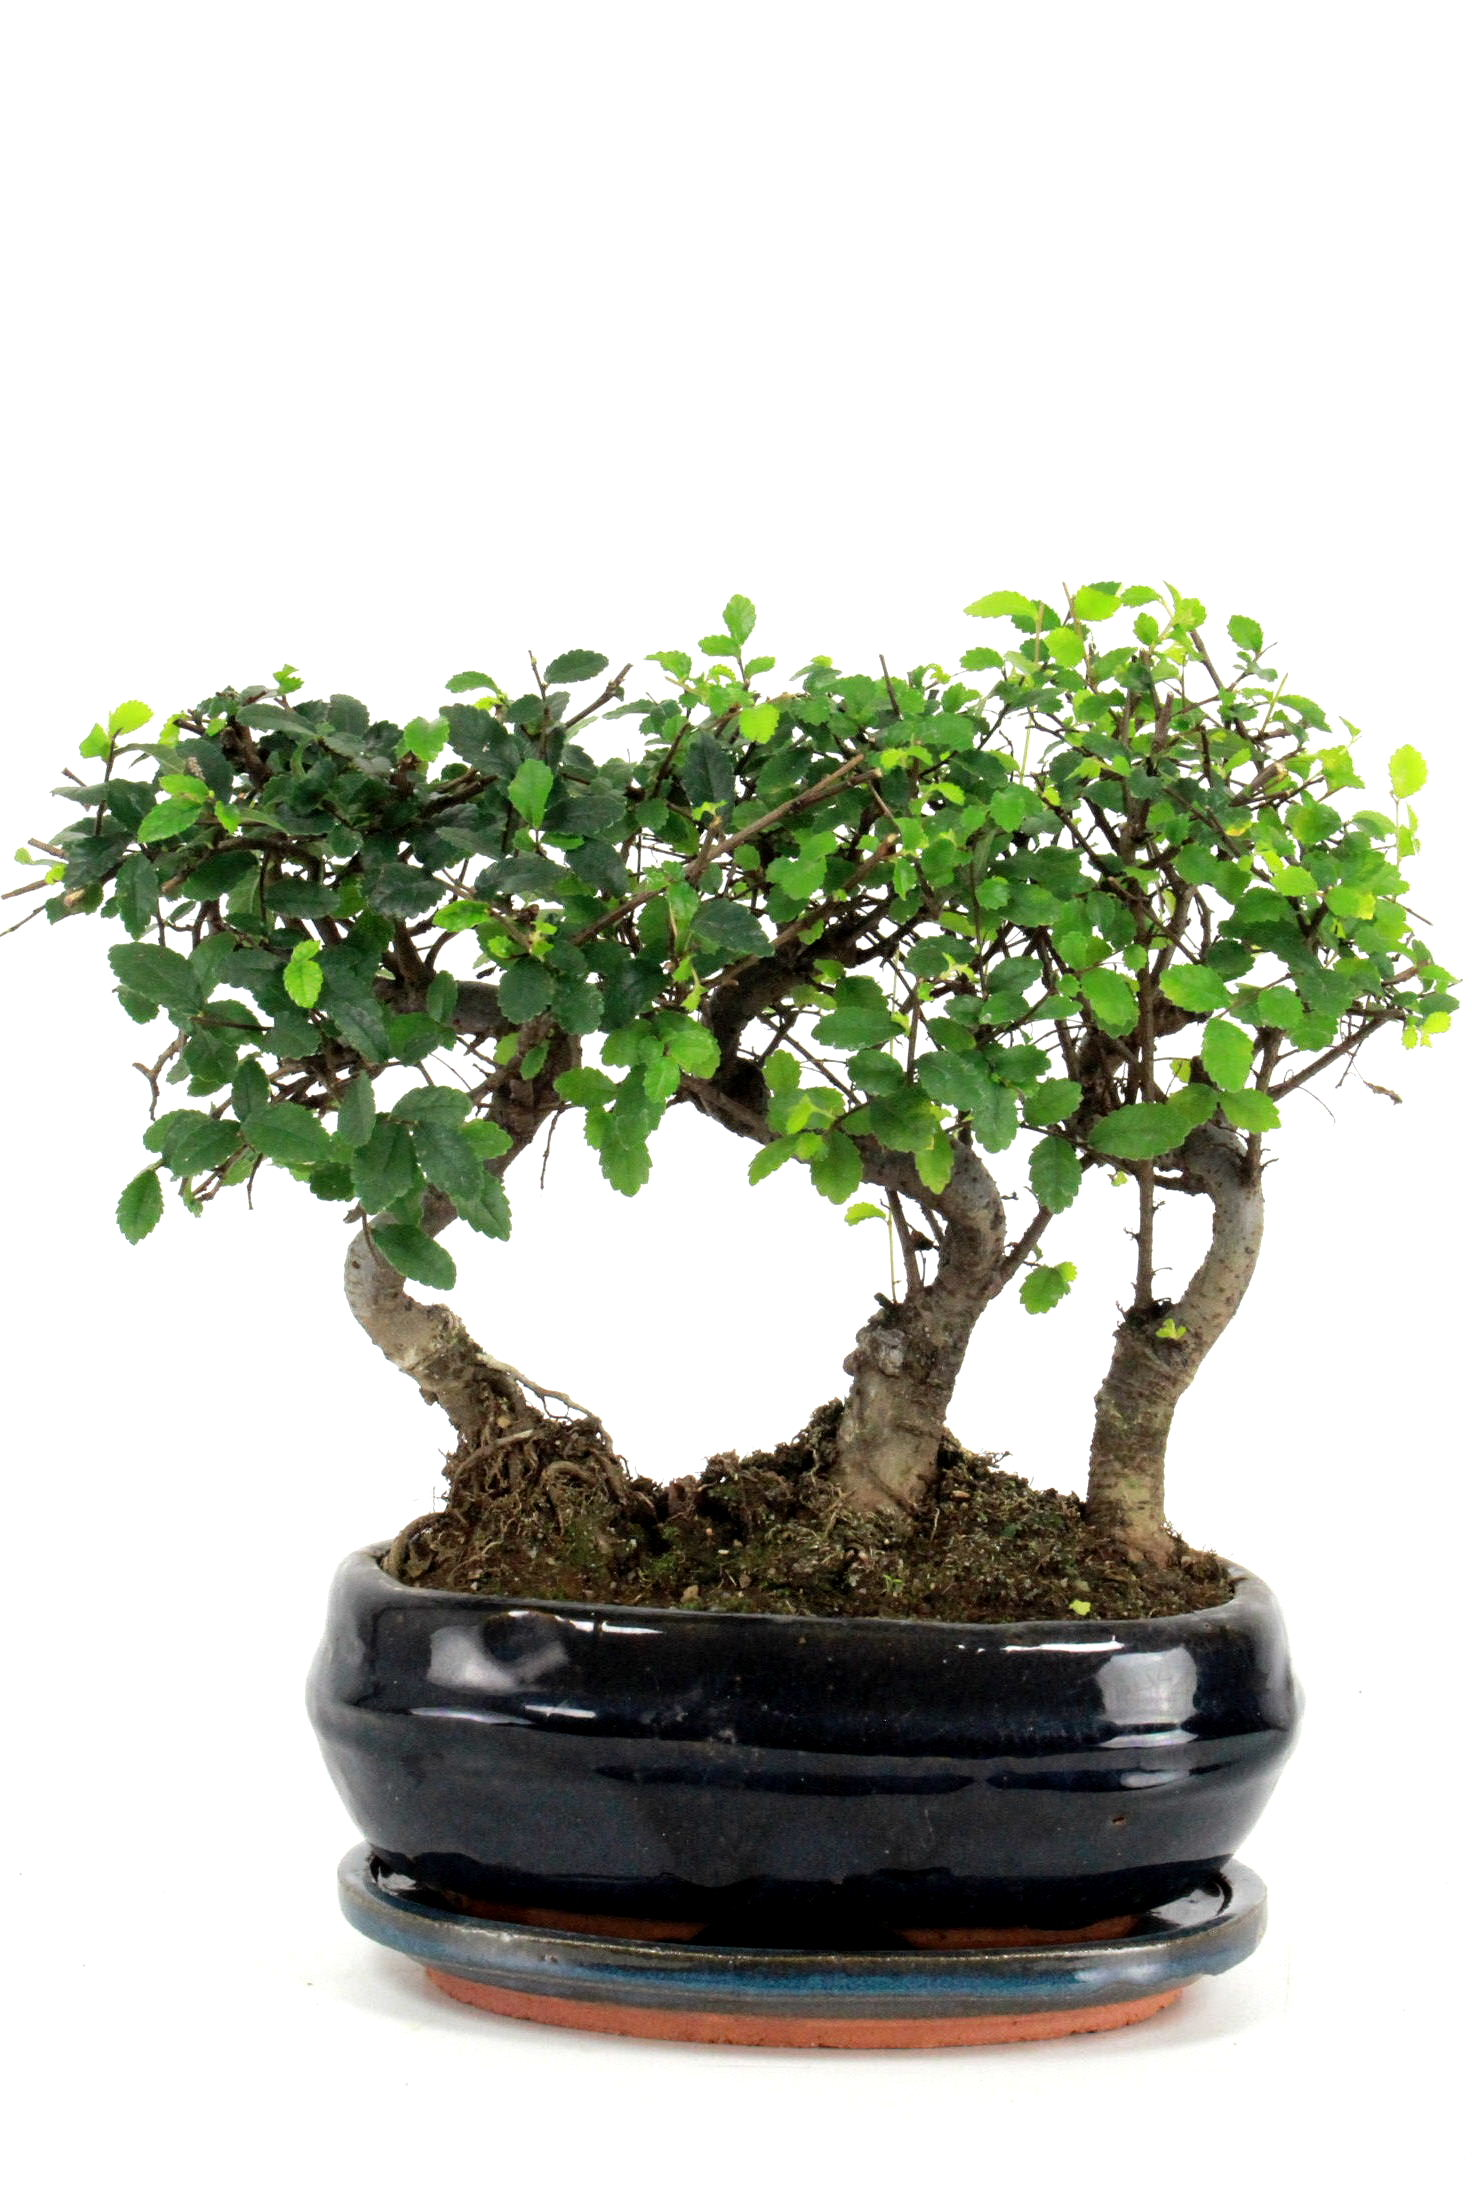 bonsai chinesische ulme gruppenpflanzung 30 cm 193 bei oyaki bonsai kaufen. Black Bedroom Furniture Sets. Home Design Ideas